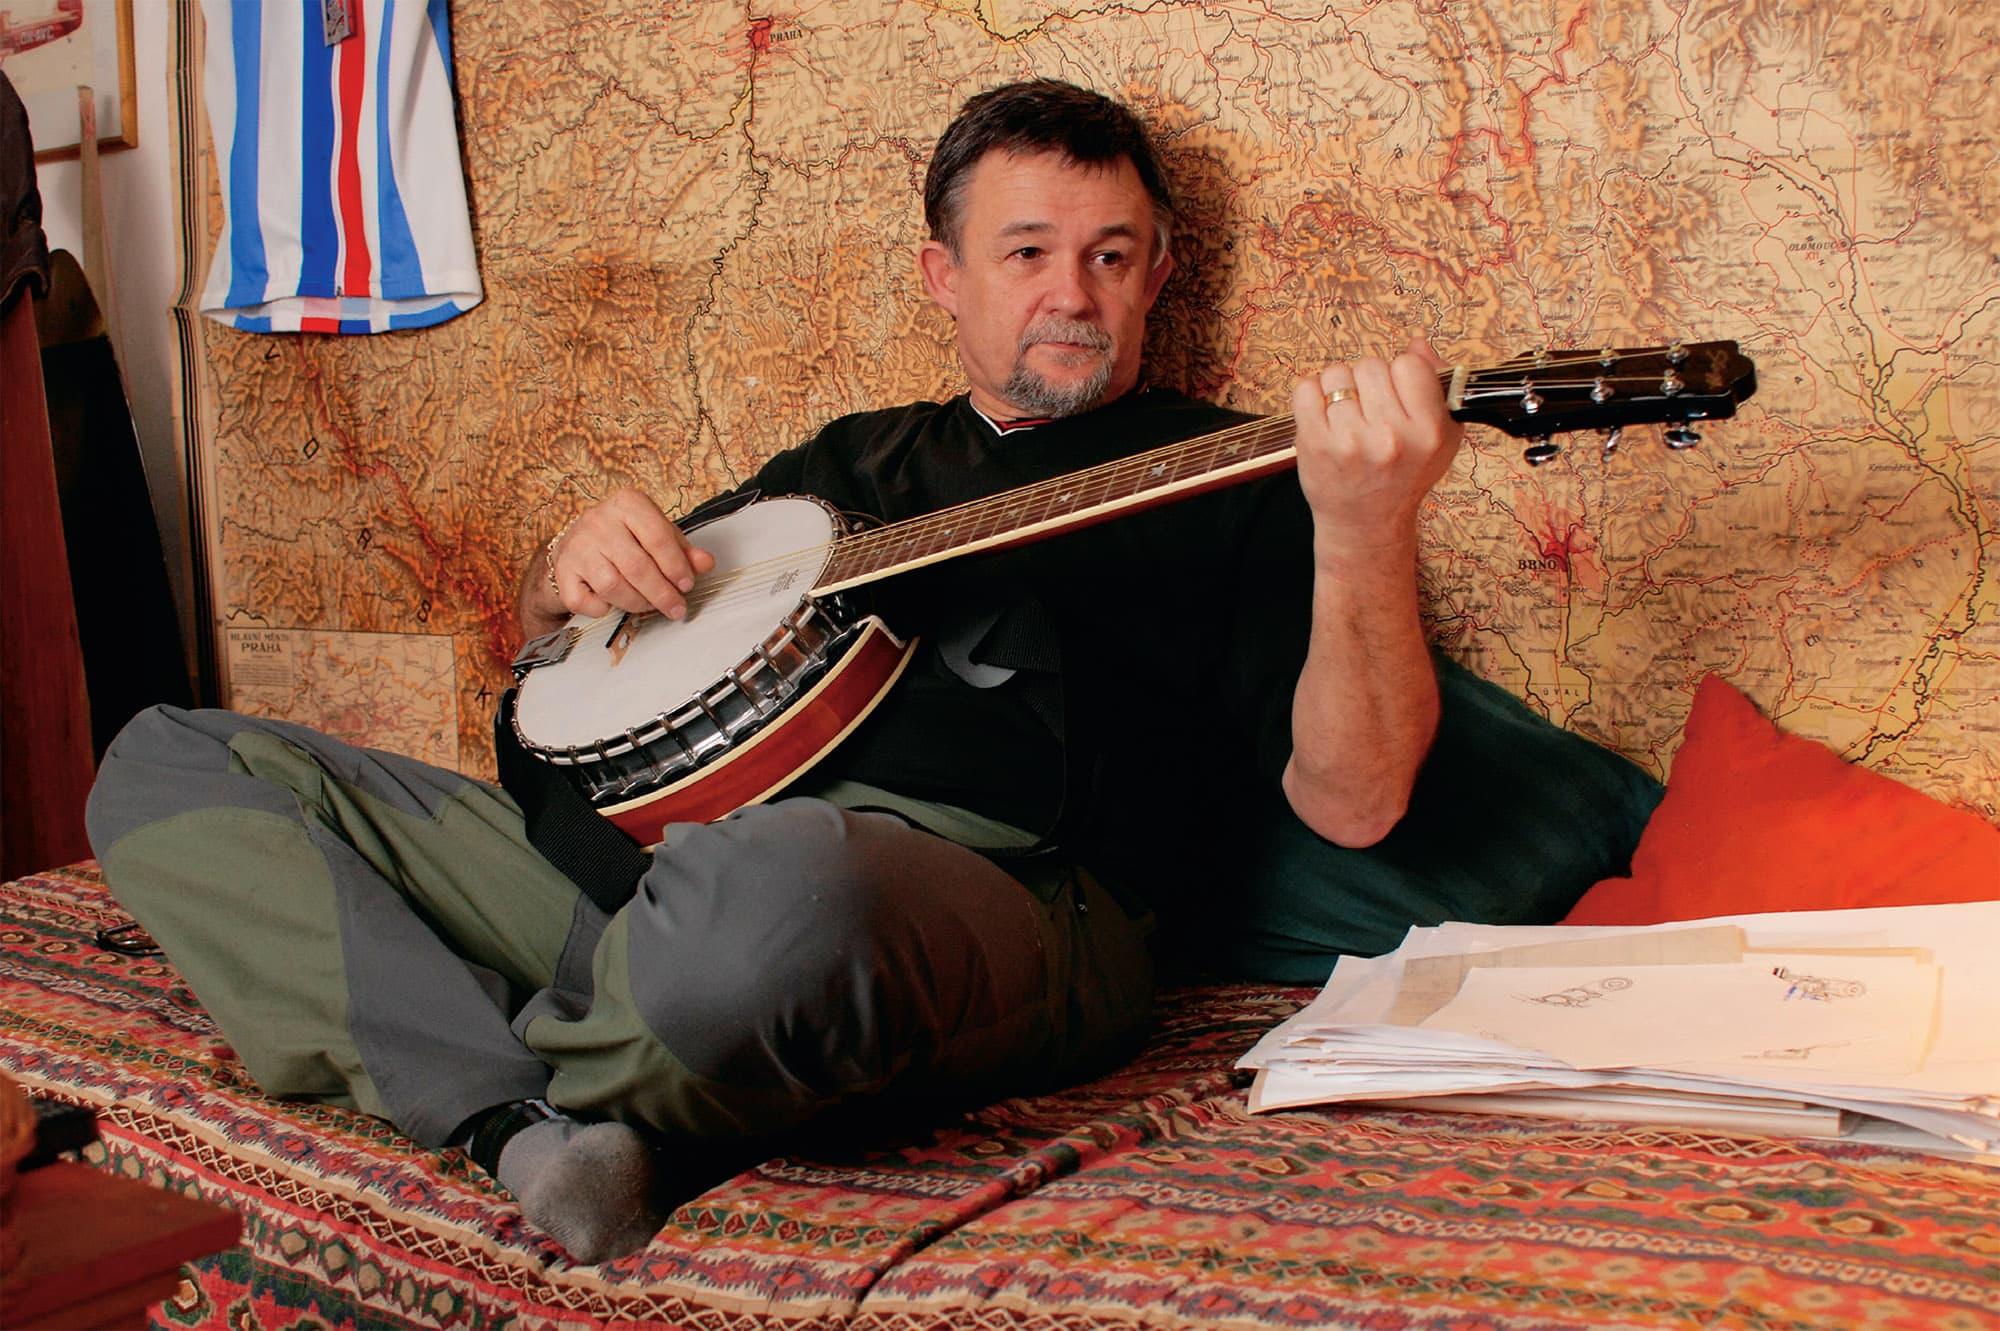 Countryman Svatopluk Zatloukal